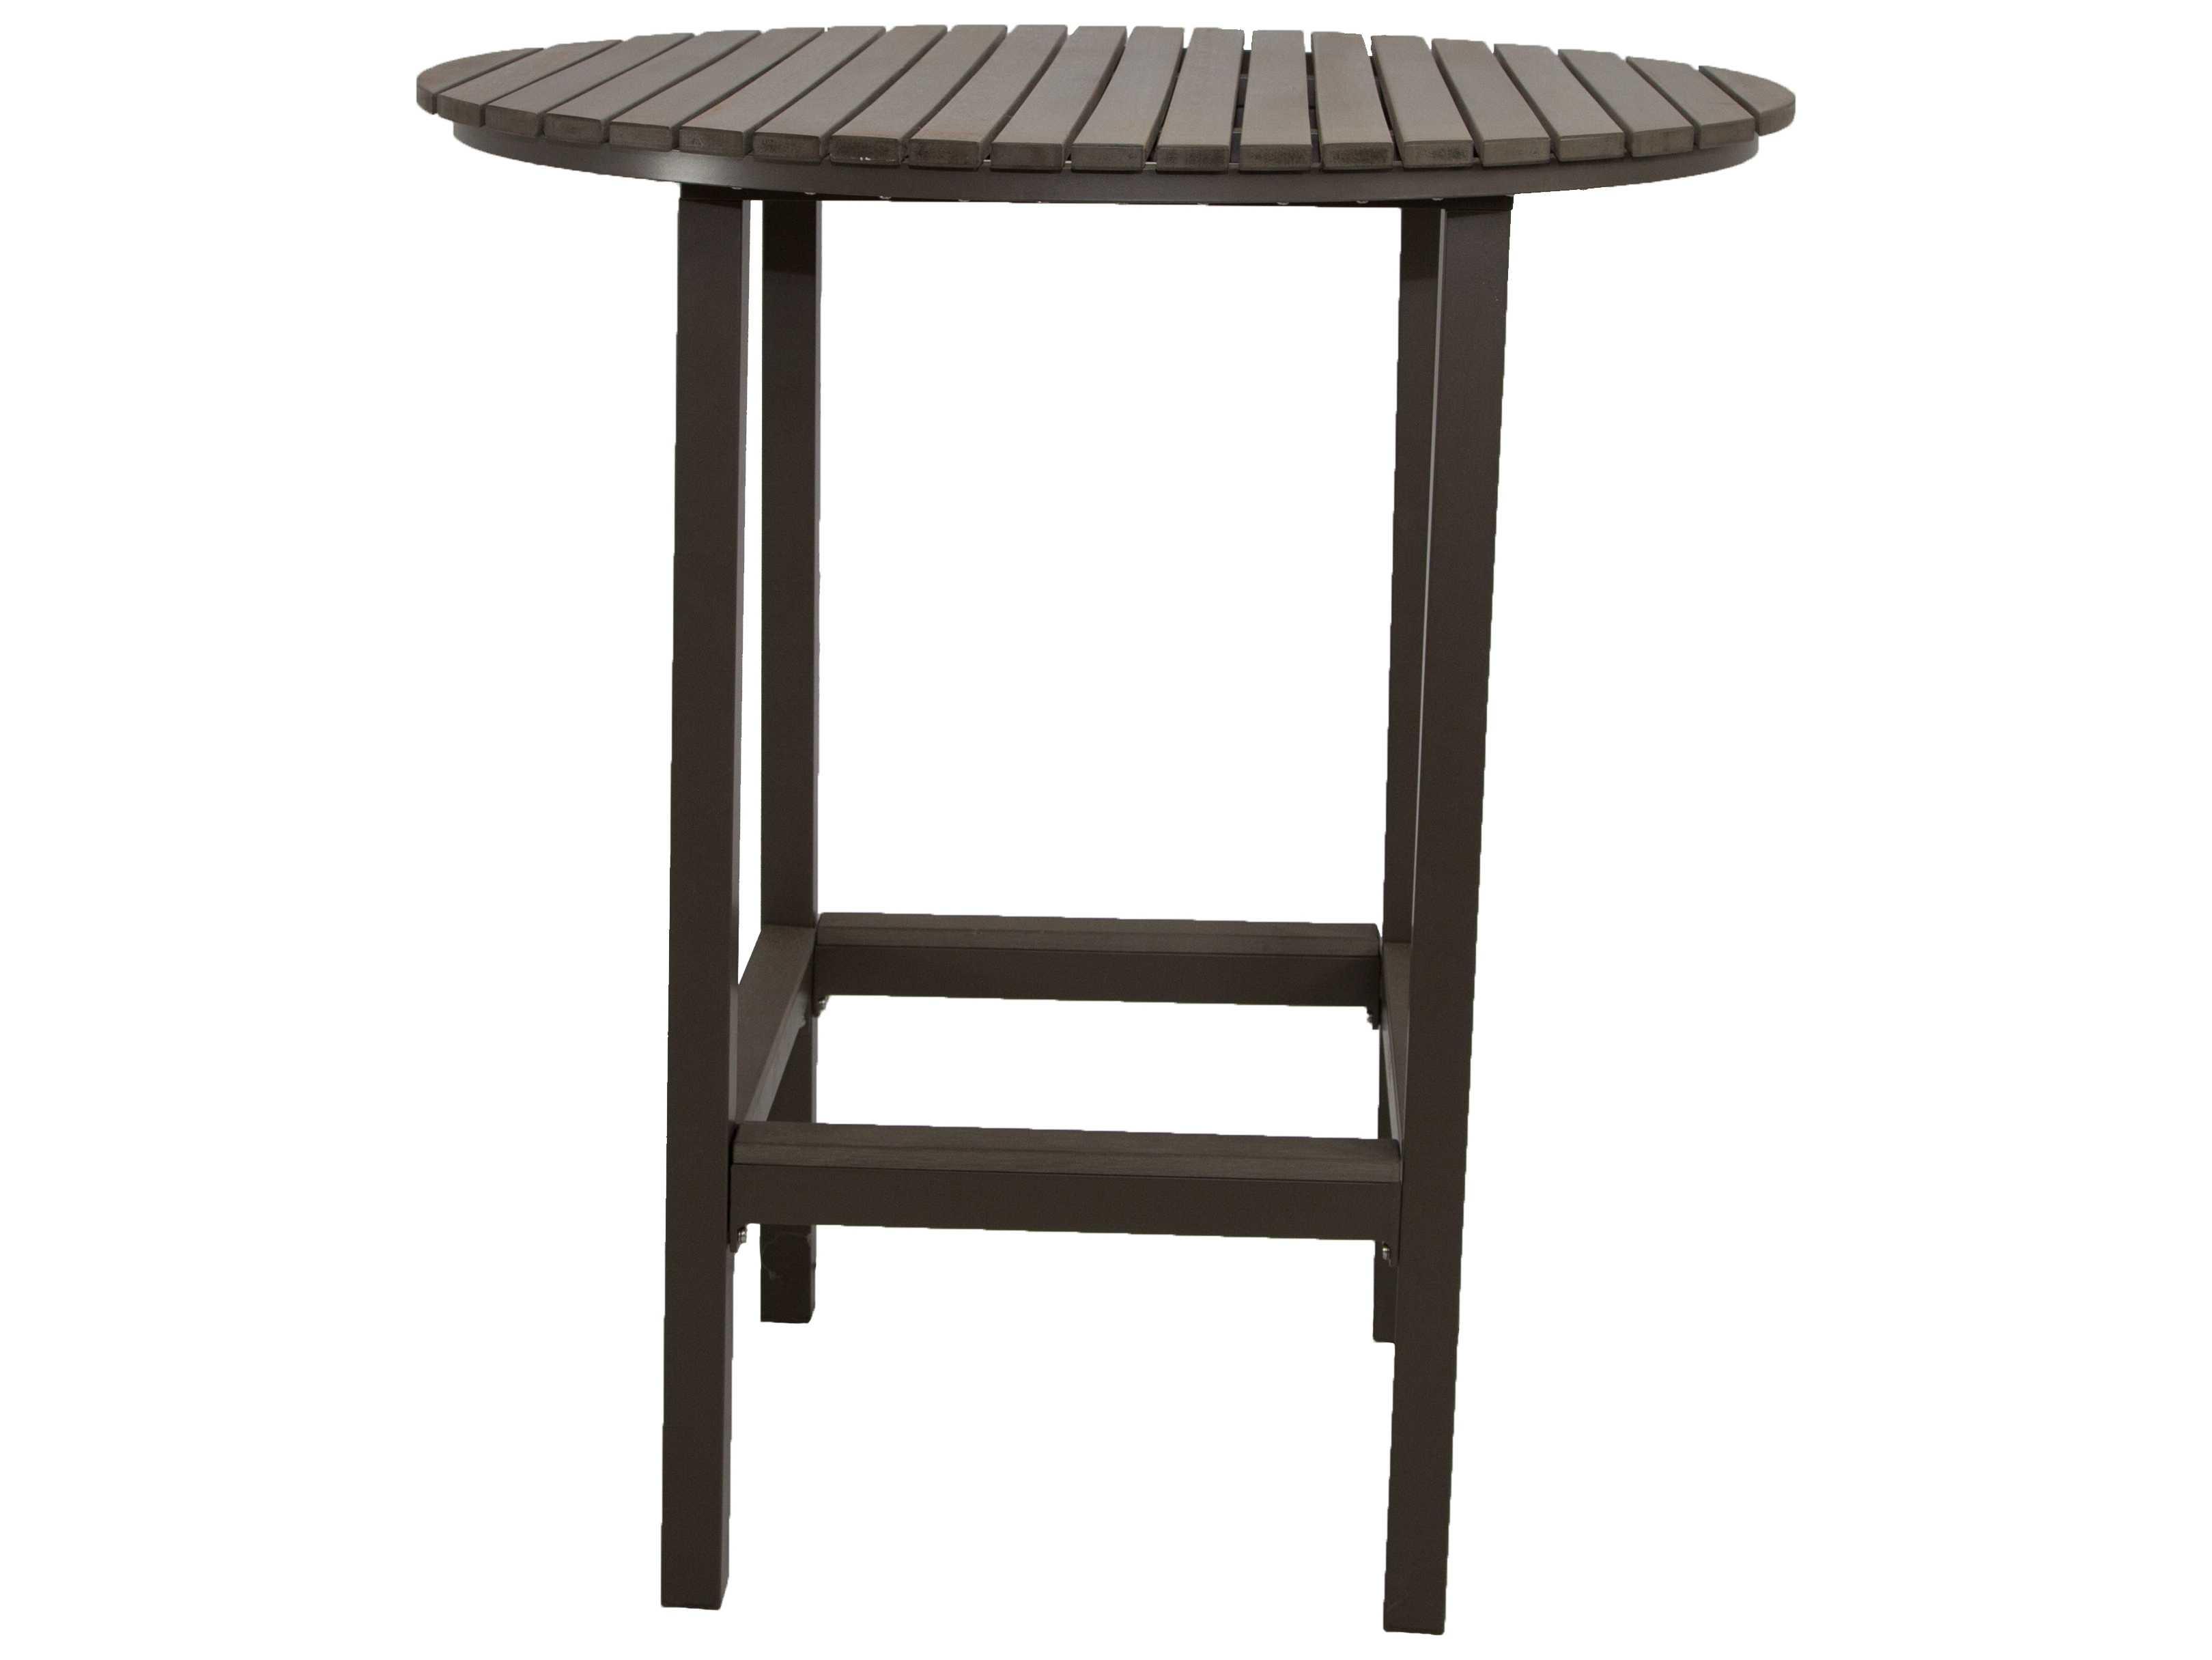 Patio heaven riviera aluminum 36 round bar table round for Patio heaven